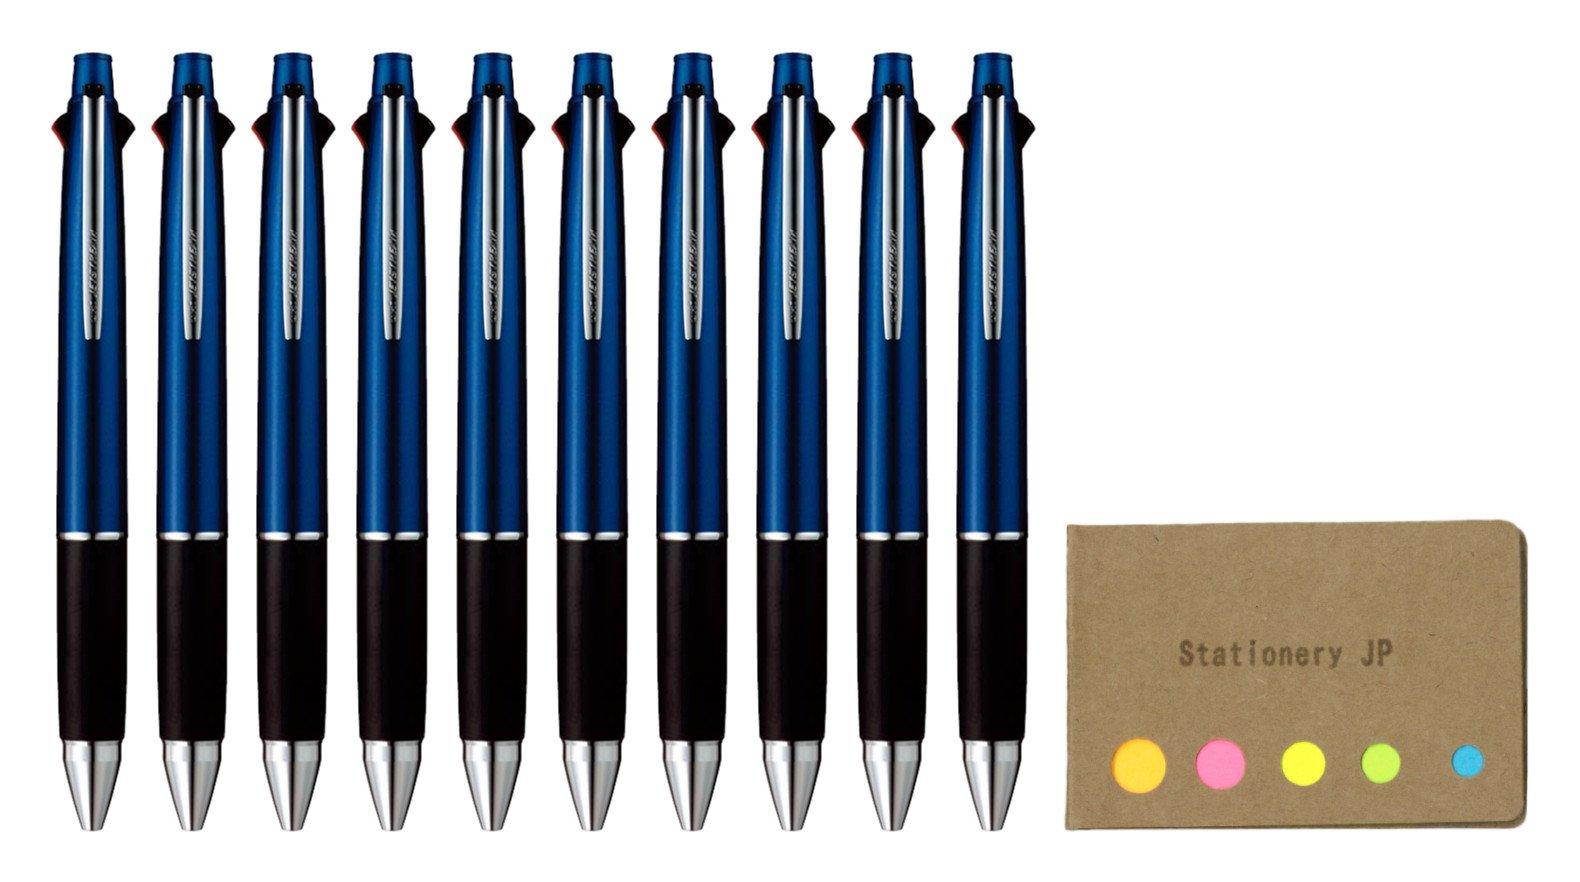 Uni-ball Jetstream 4&1 4 Color Extra Fine Point 0.38mm Ballpoint Multi Pen, Navy Barrel, 10-pack, Sticky Notes Value Set